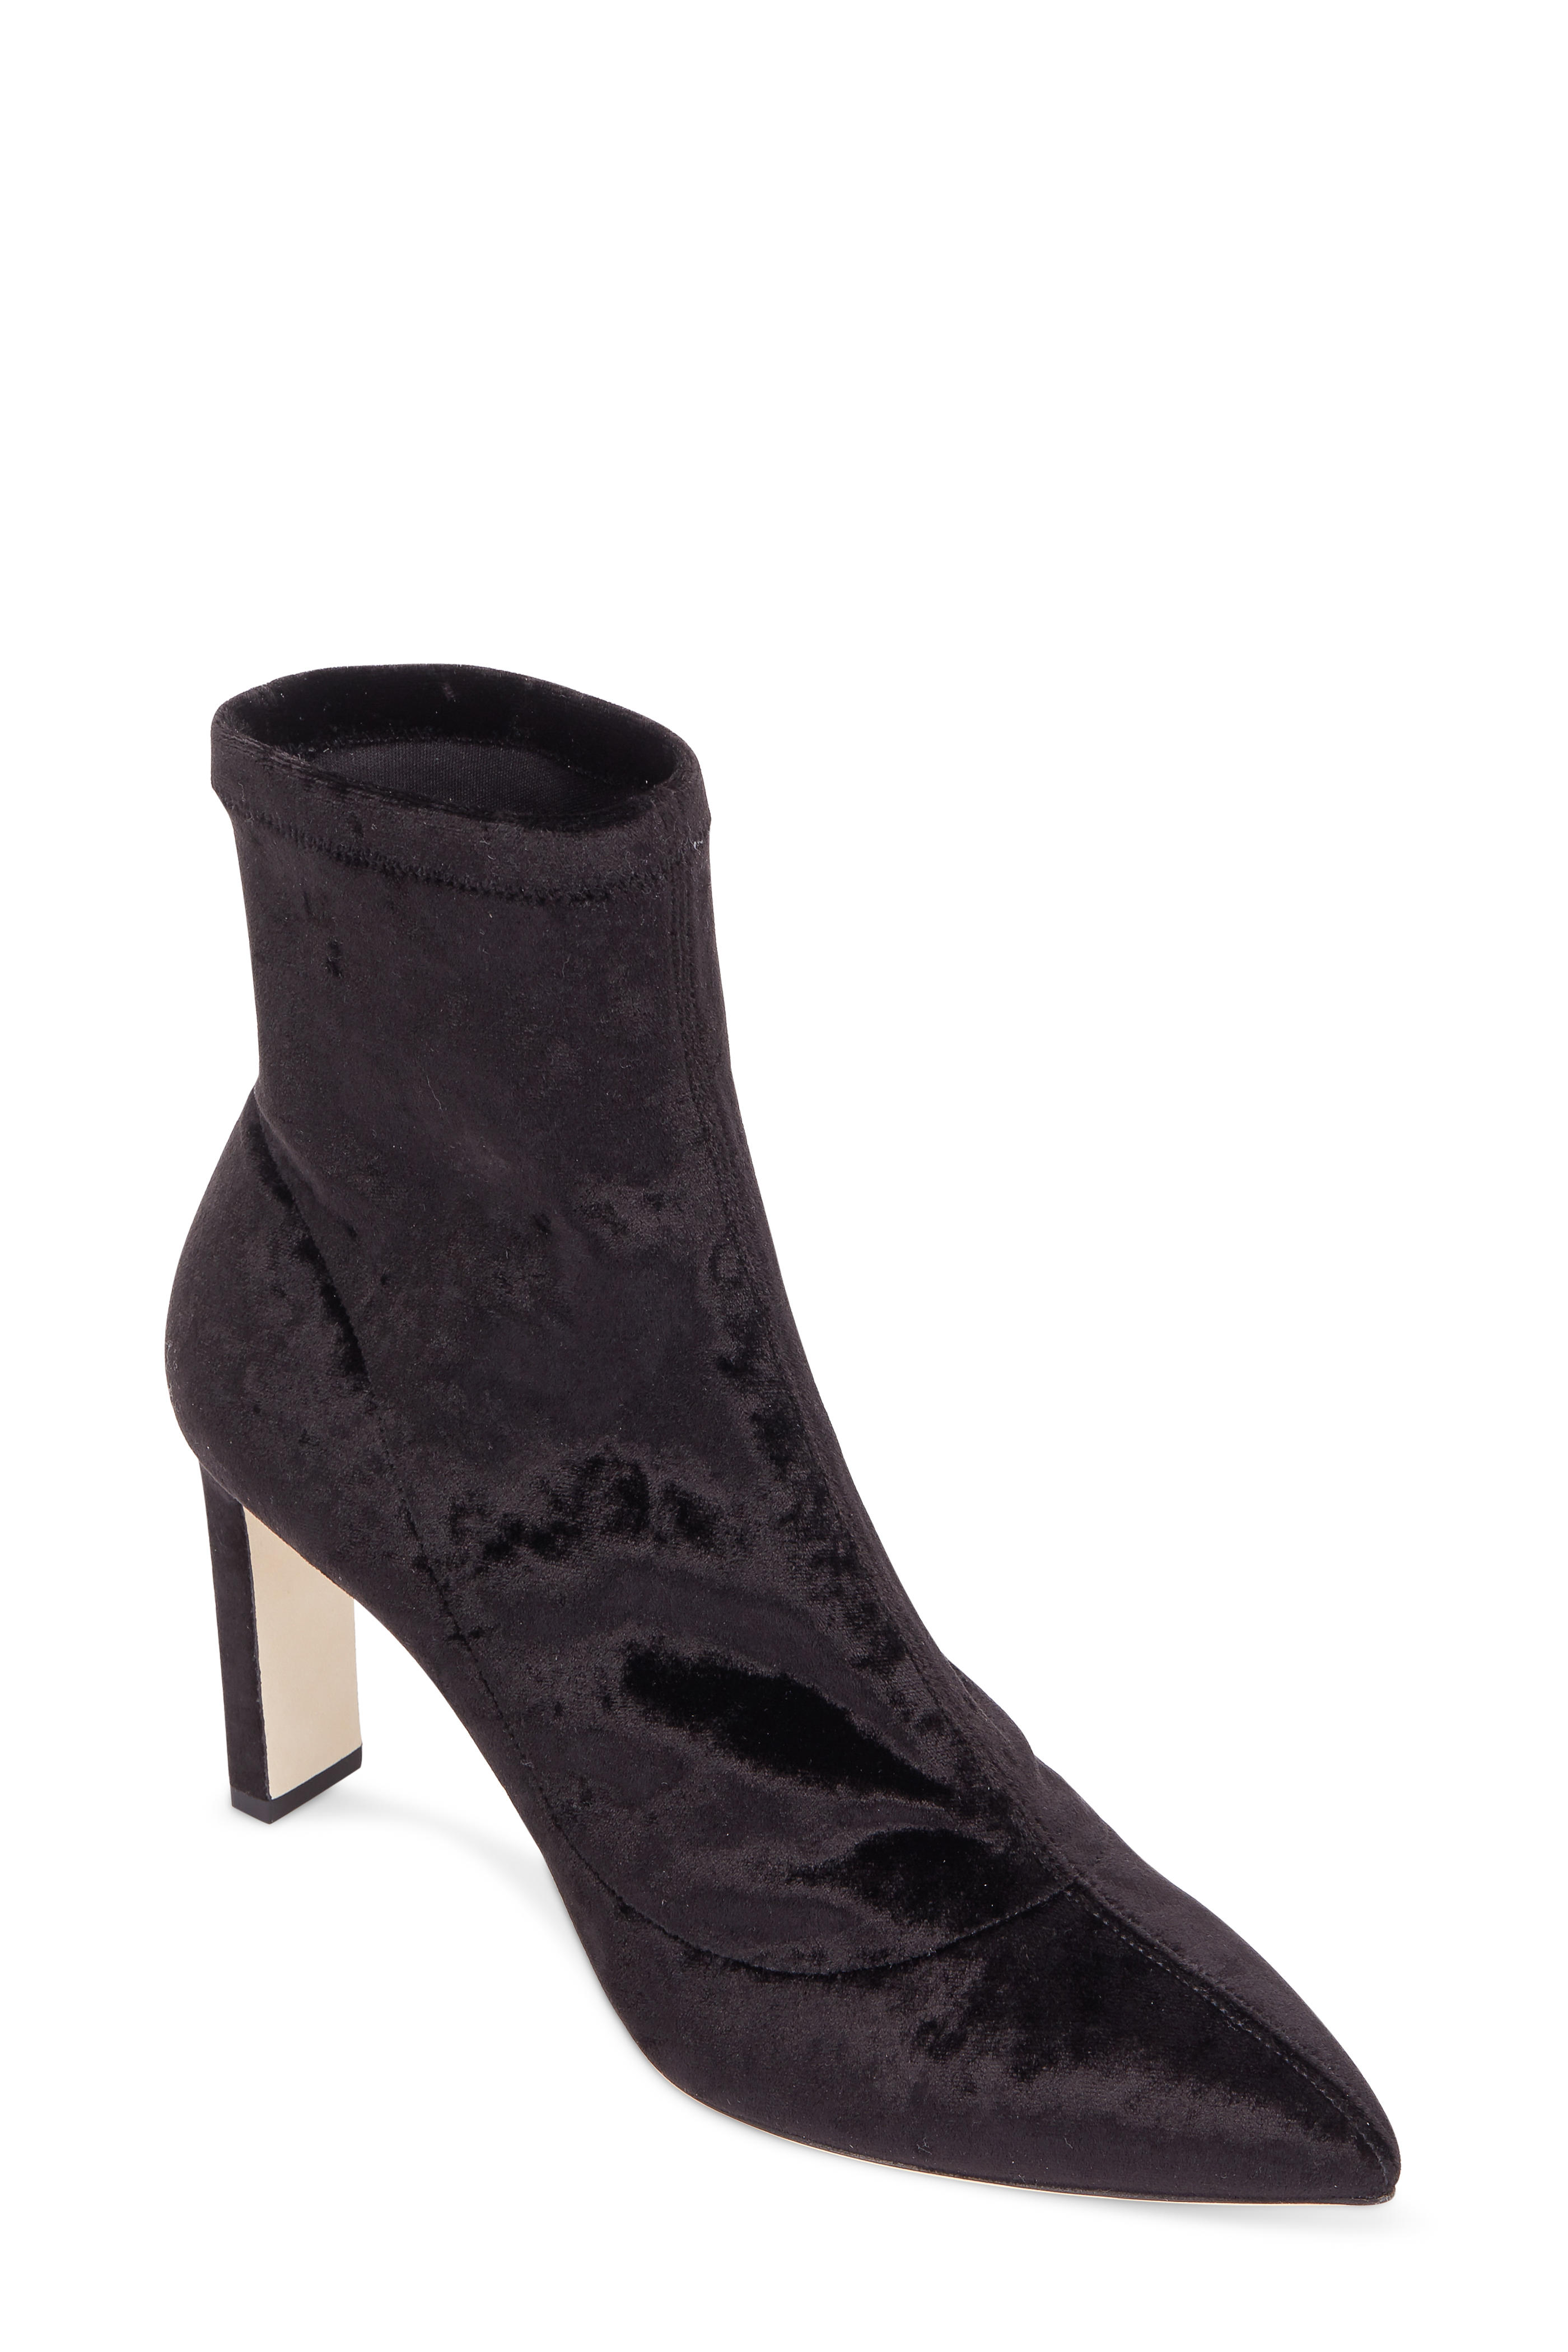 dd940b4a4a012 Jimmy Choo - Louella Black Stretch Velvet Ankle Boot, 85mm ...